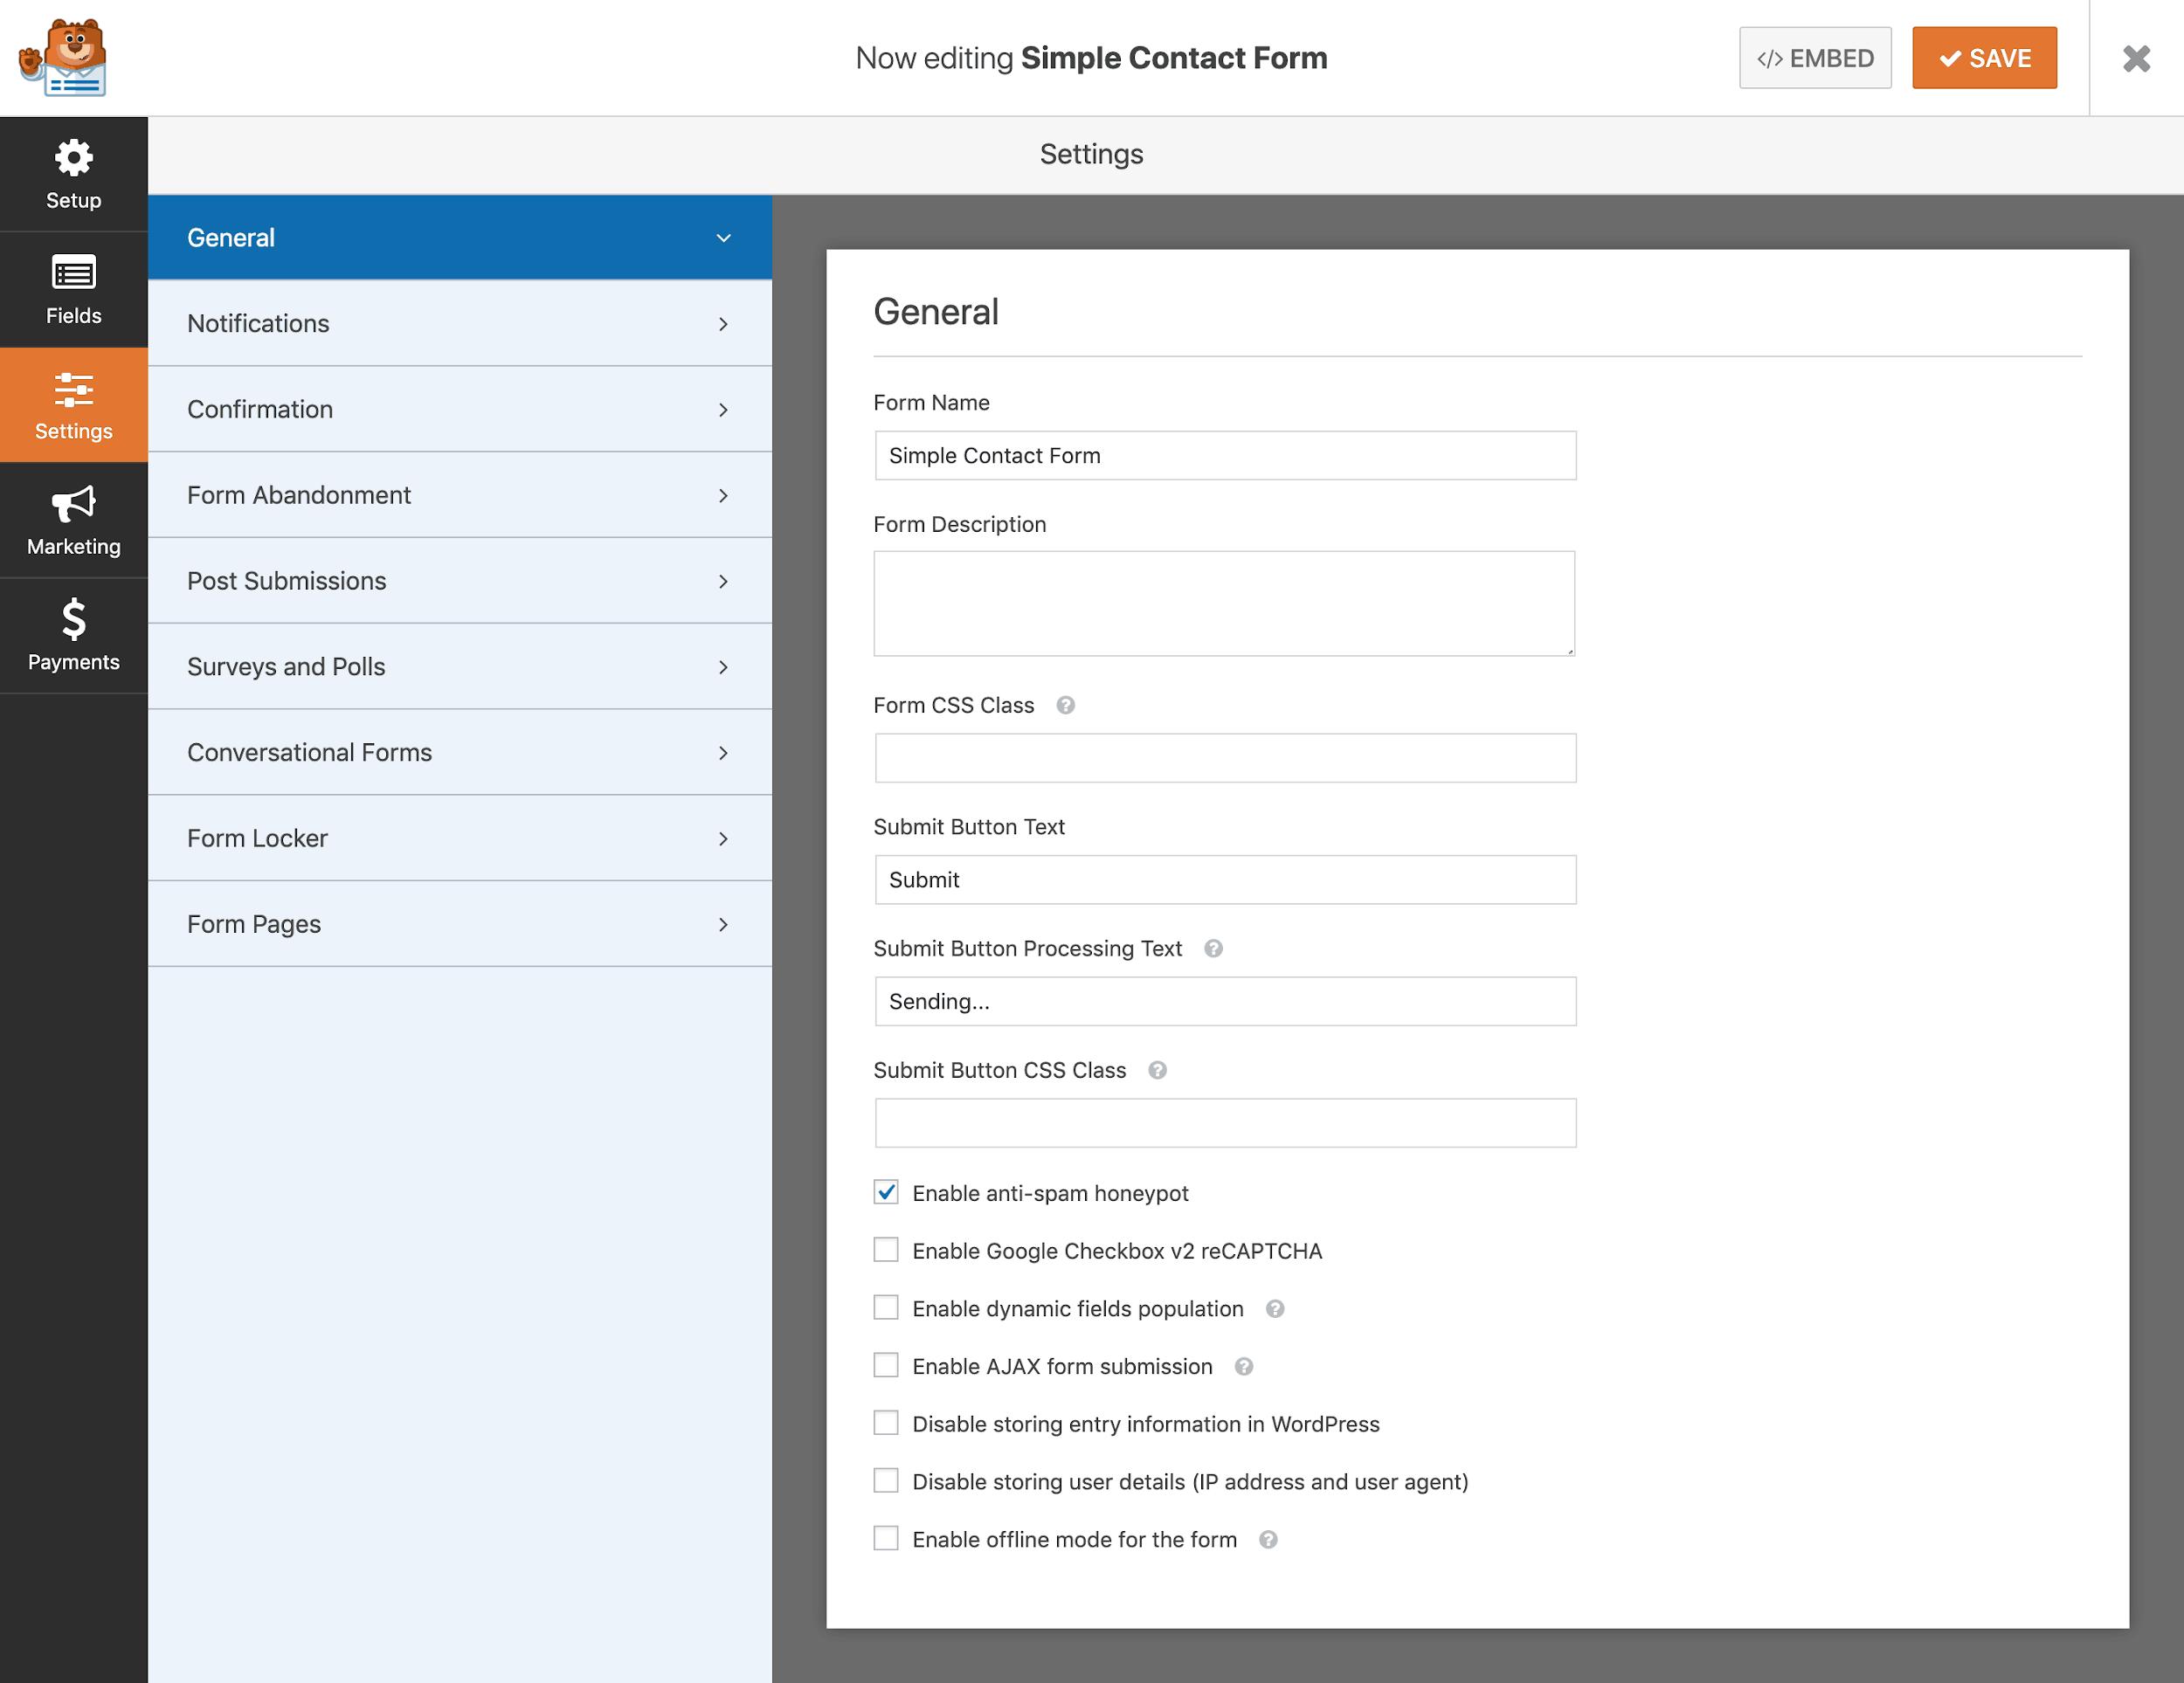 WPForms screenshot - Settings